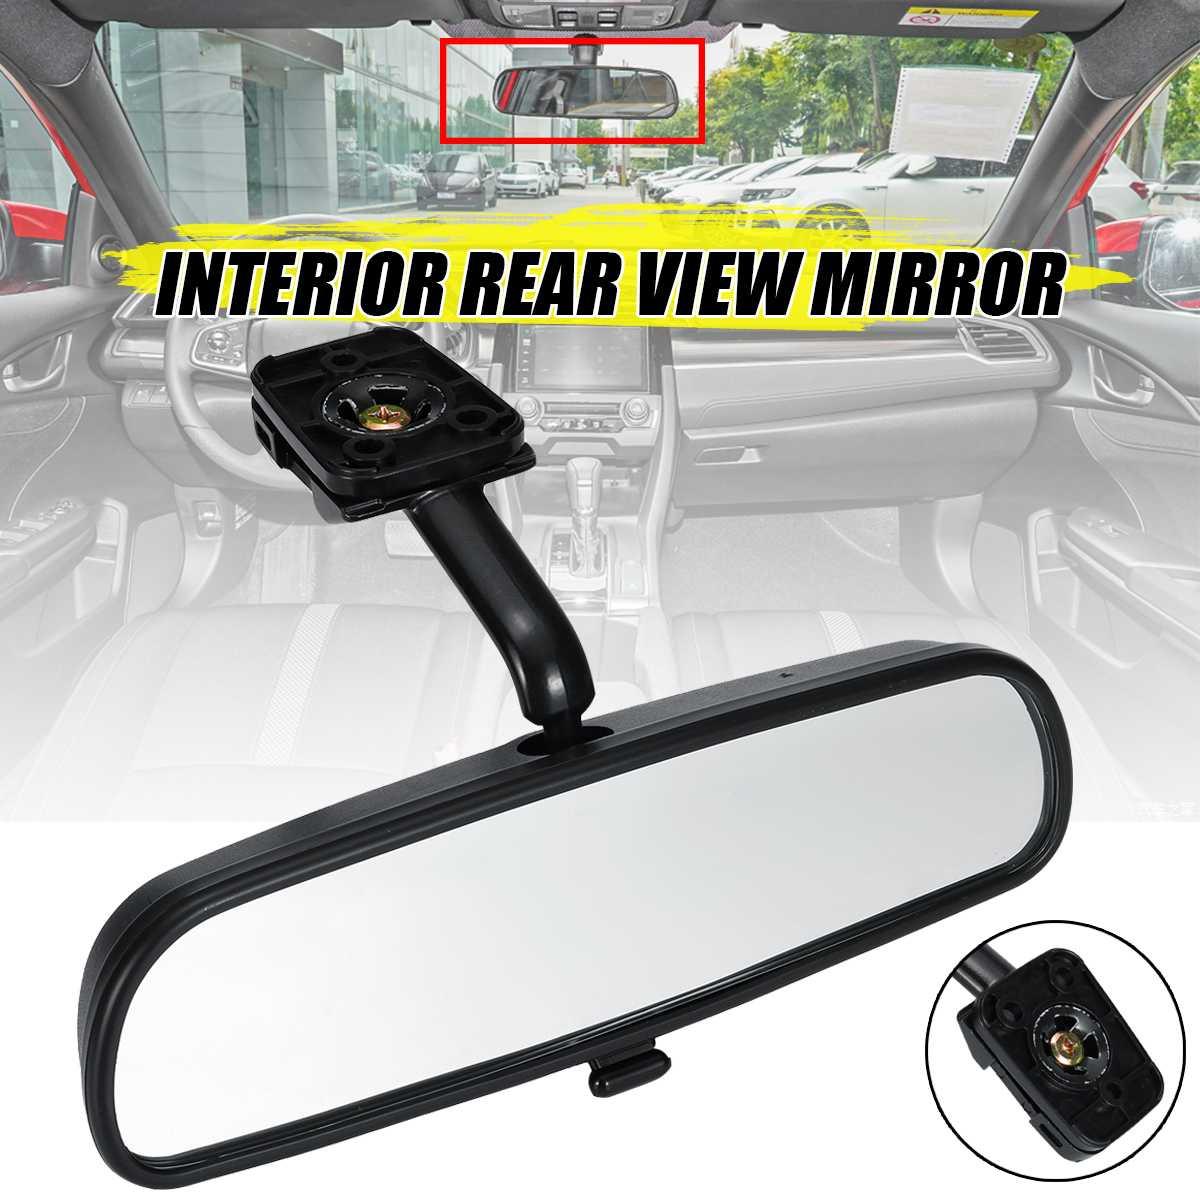 Car Interior Rearview Mirror Rear View Mirror Automobile Car Interior Accessories For Honda Civic 1996 1997 1998 1999 2000